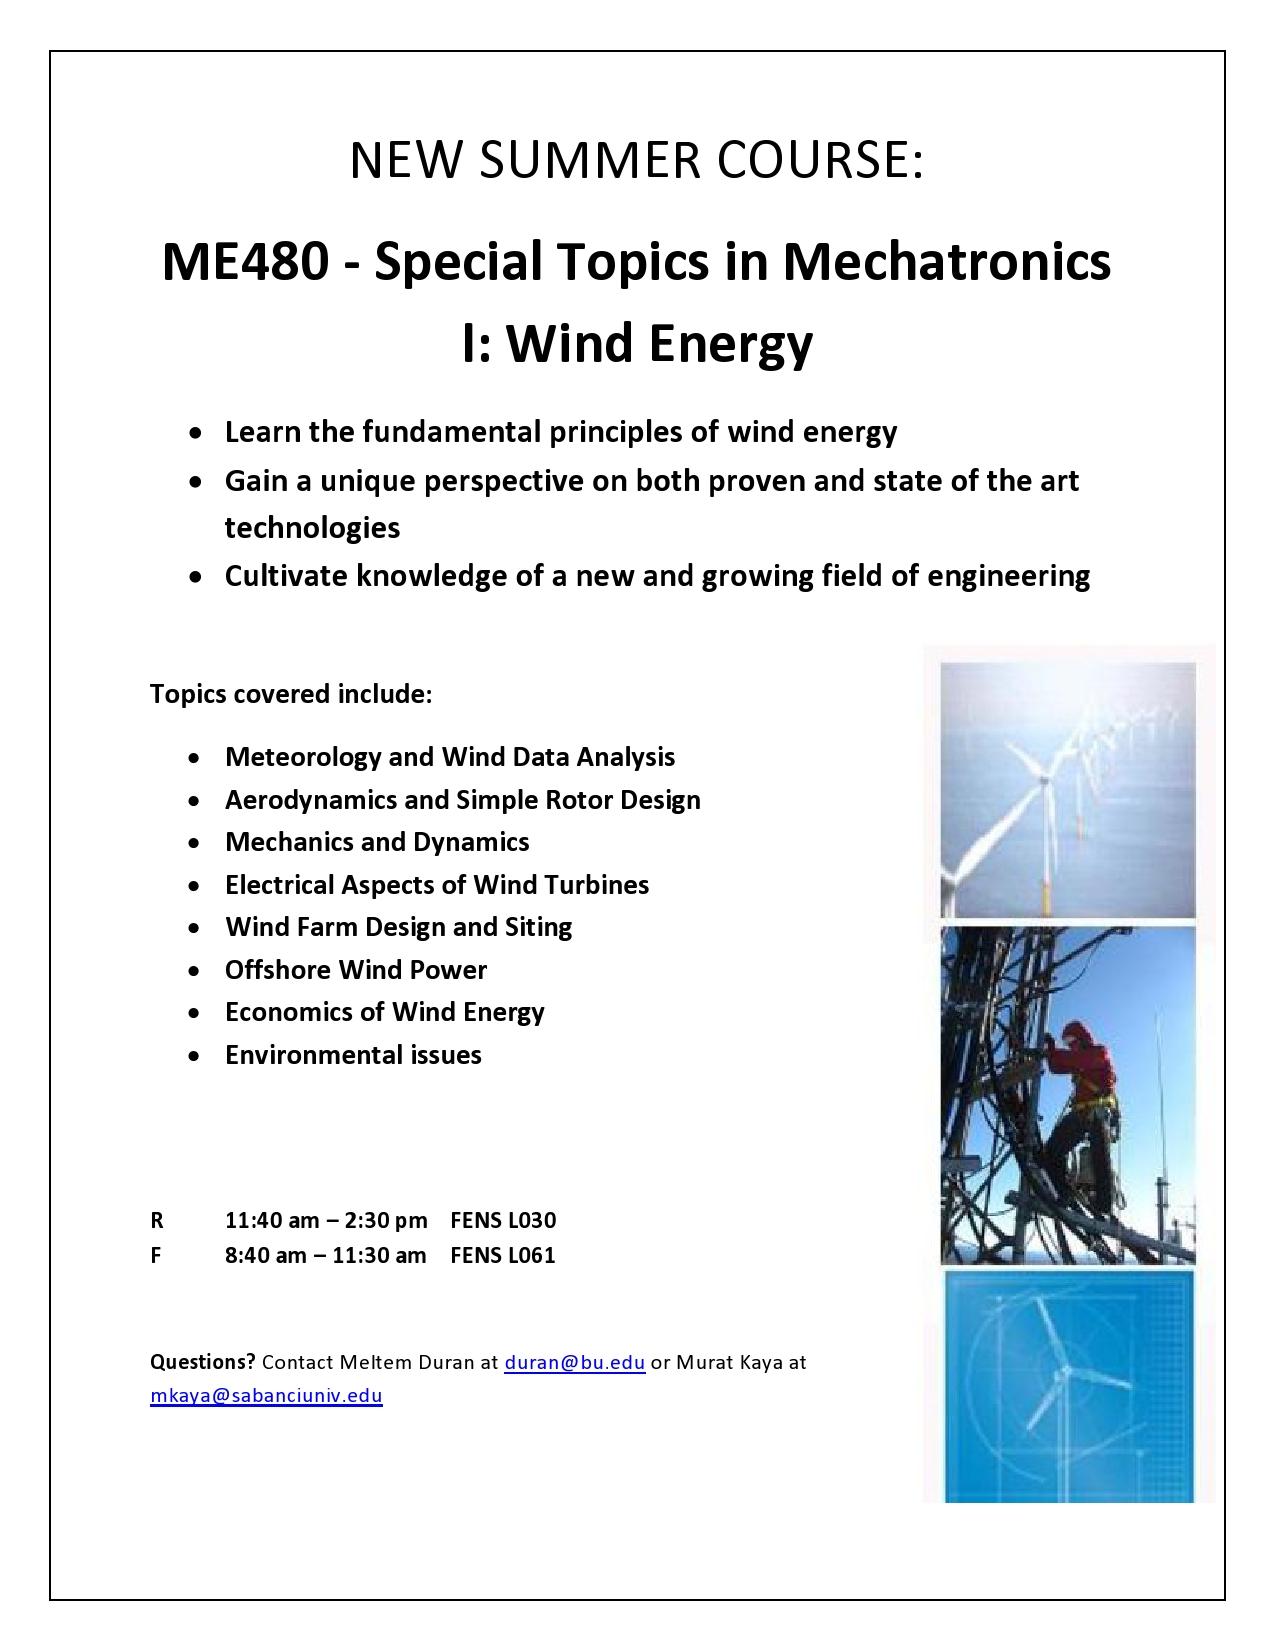 Summer School Course: ME480 - Special Topics in Mechatronics